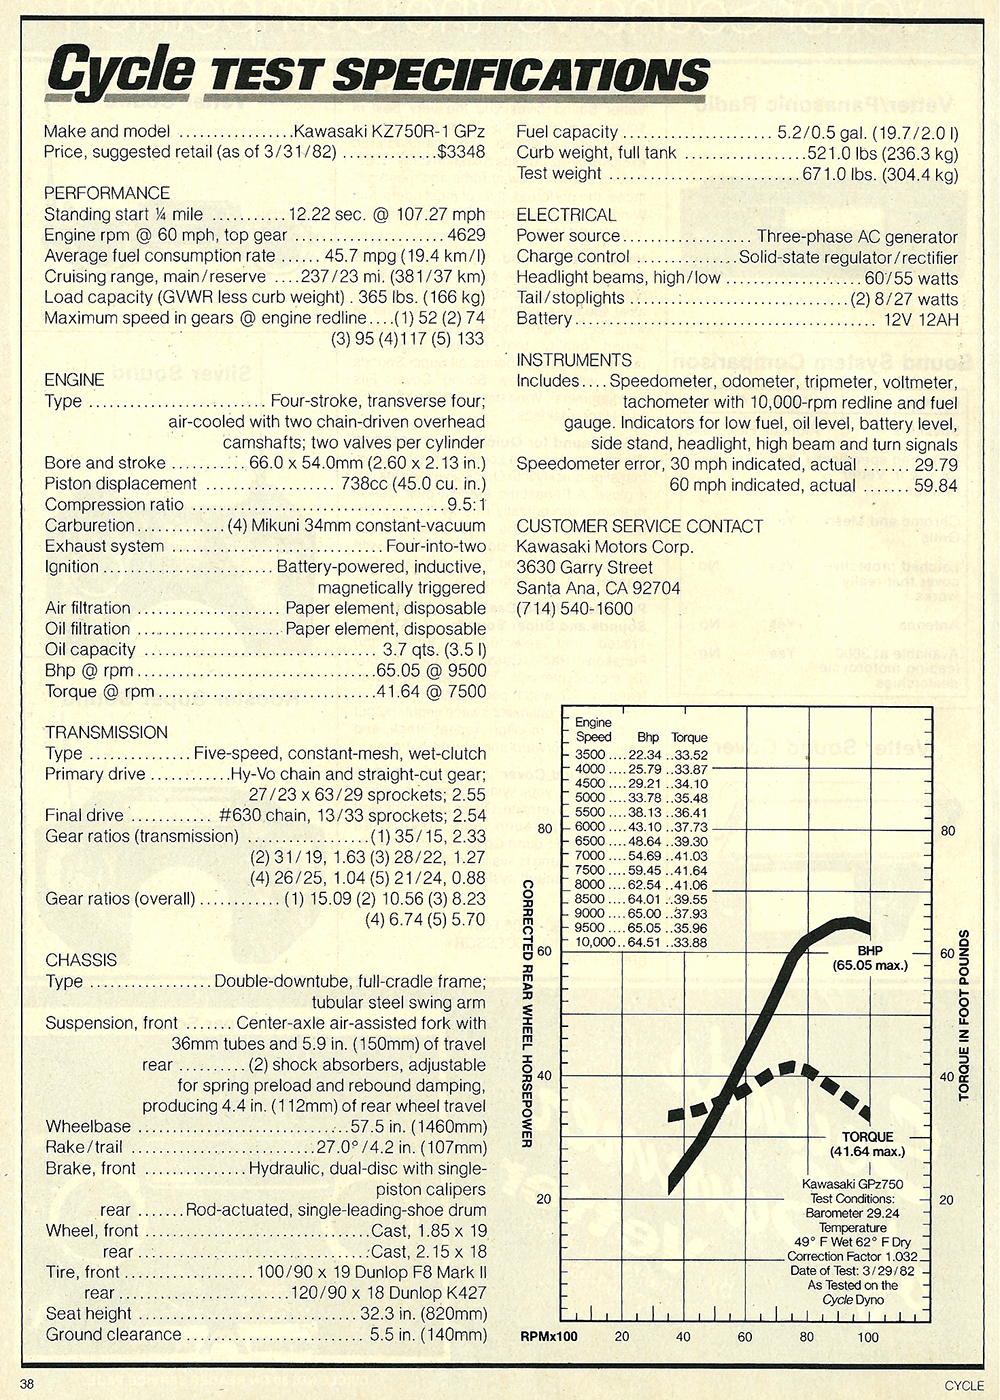 1982 Kawasaki Gpz750 road test 08.jpg